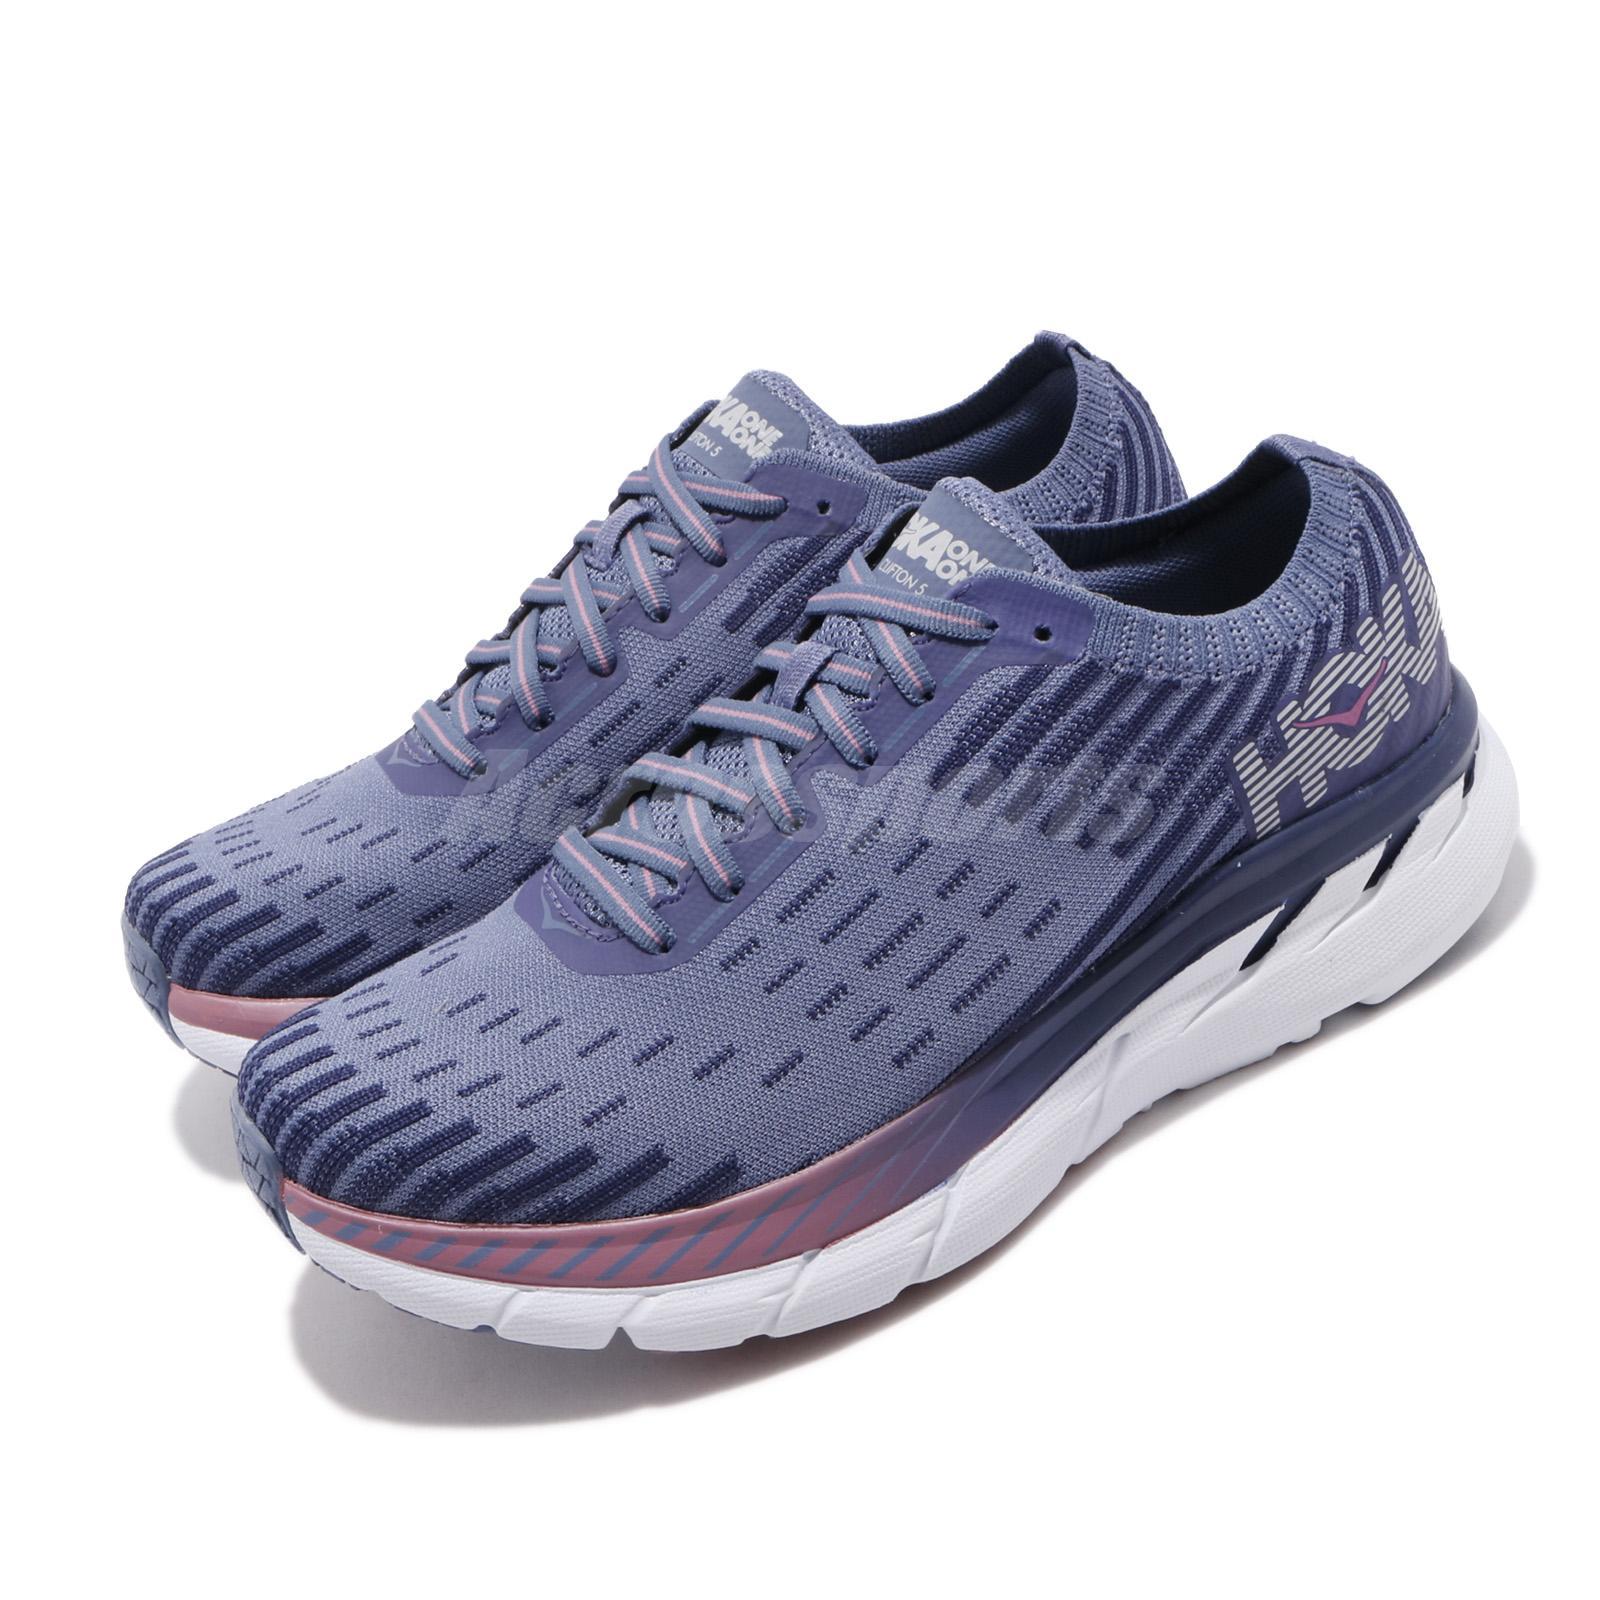 Hoka One One W Clifton 5 Knit Marlin Blue Ribbon Women Running Shoe 1094310-MBRB